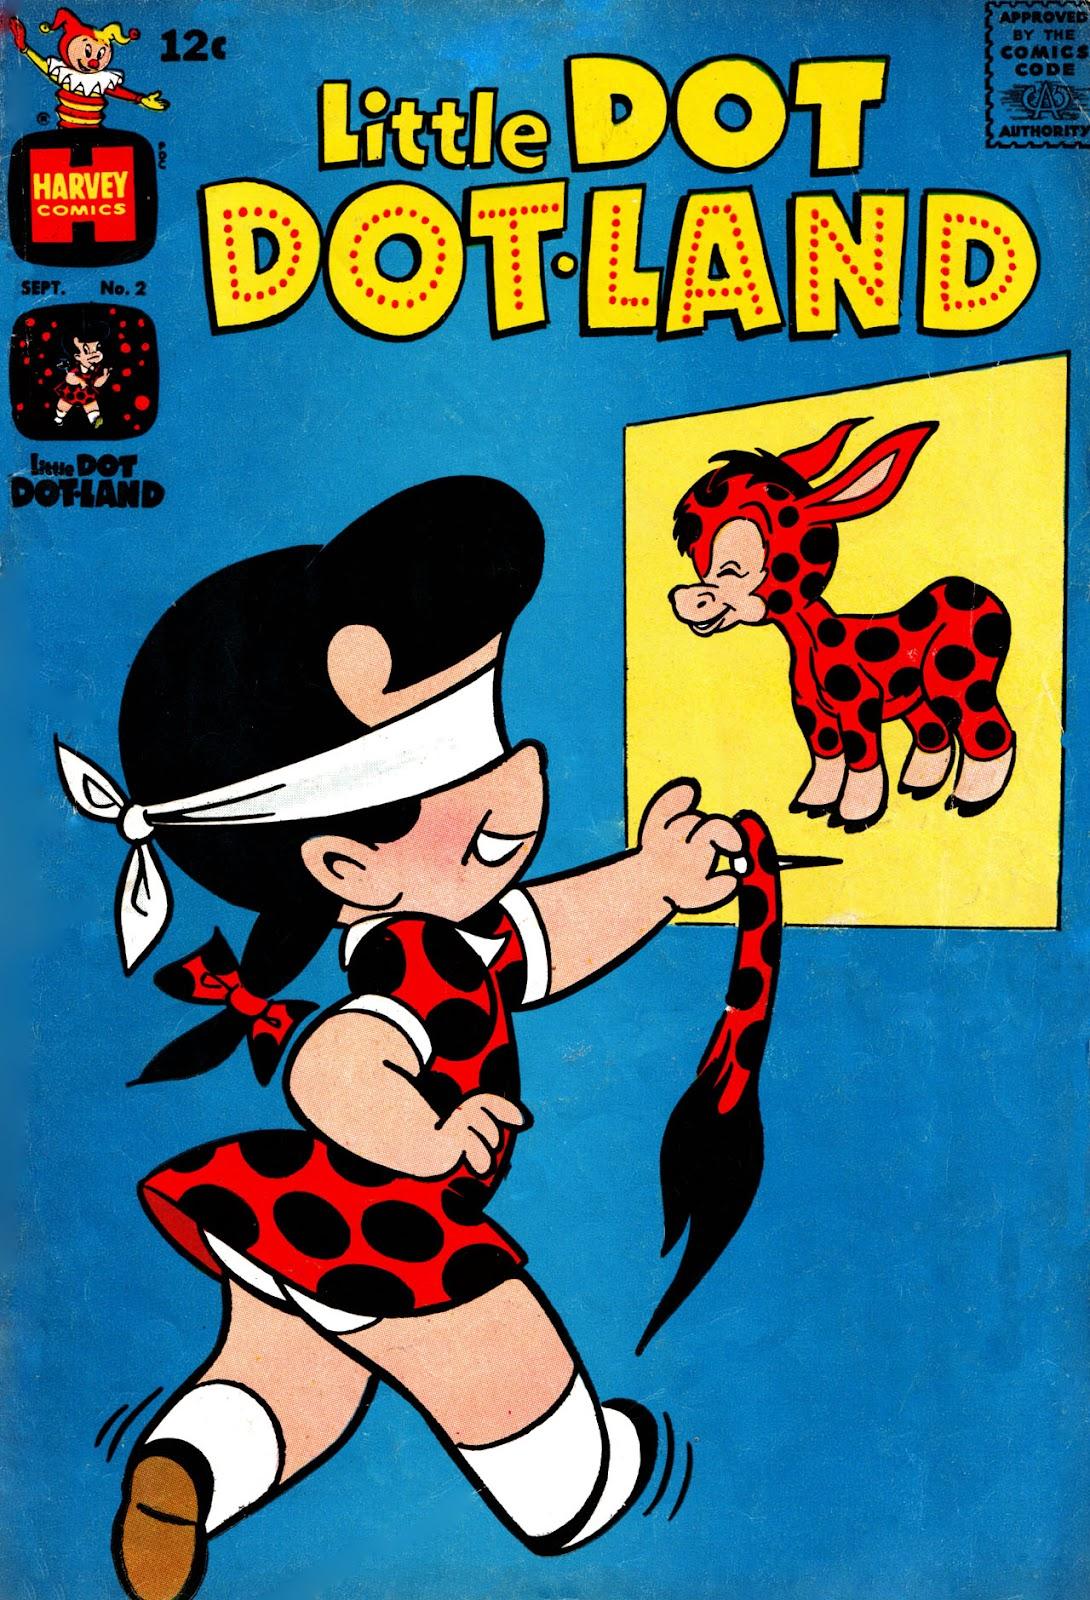 Little Dot Dotland 2 Page 1